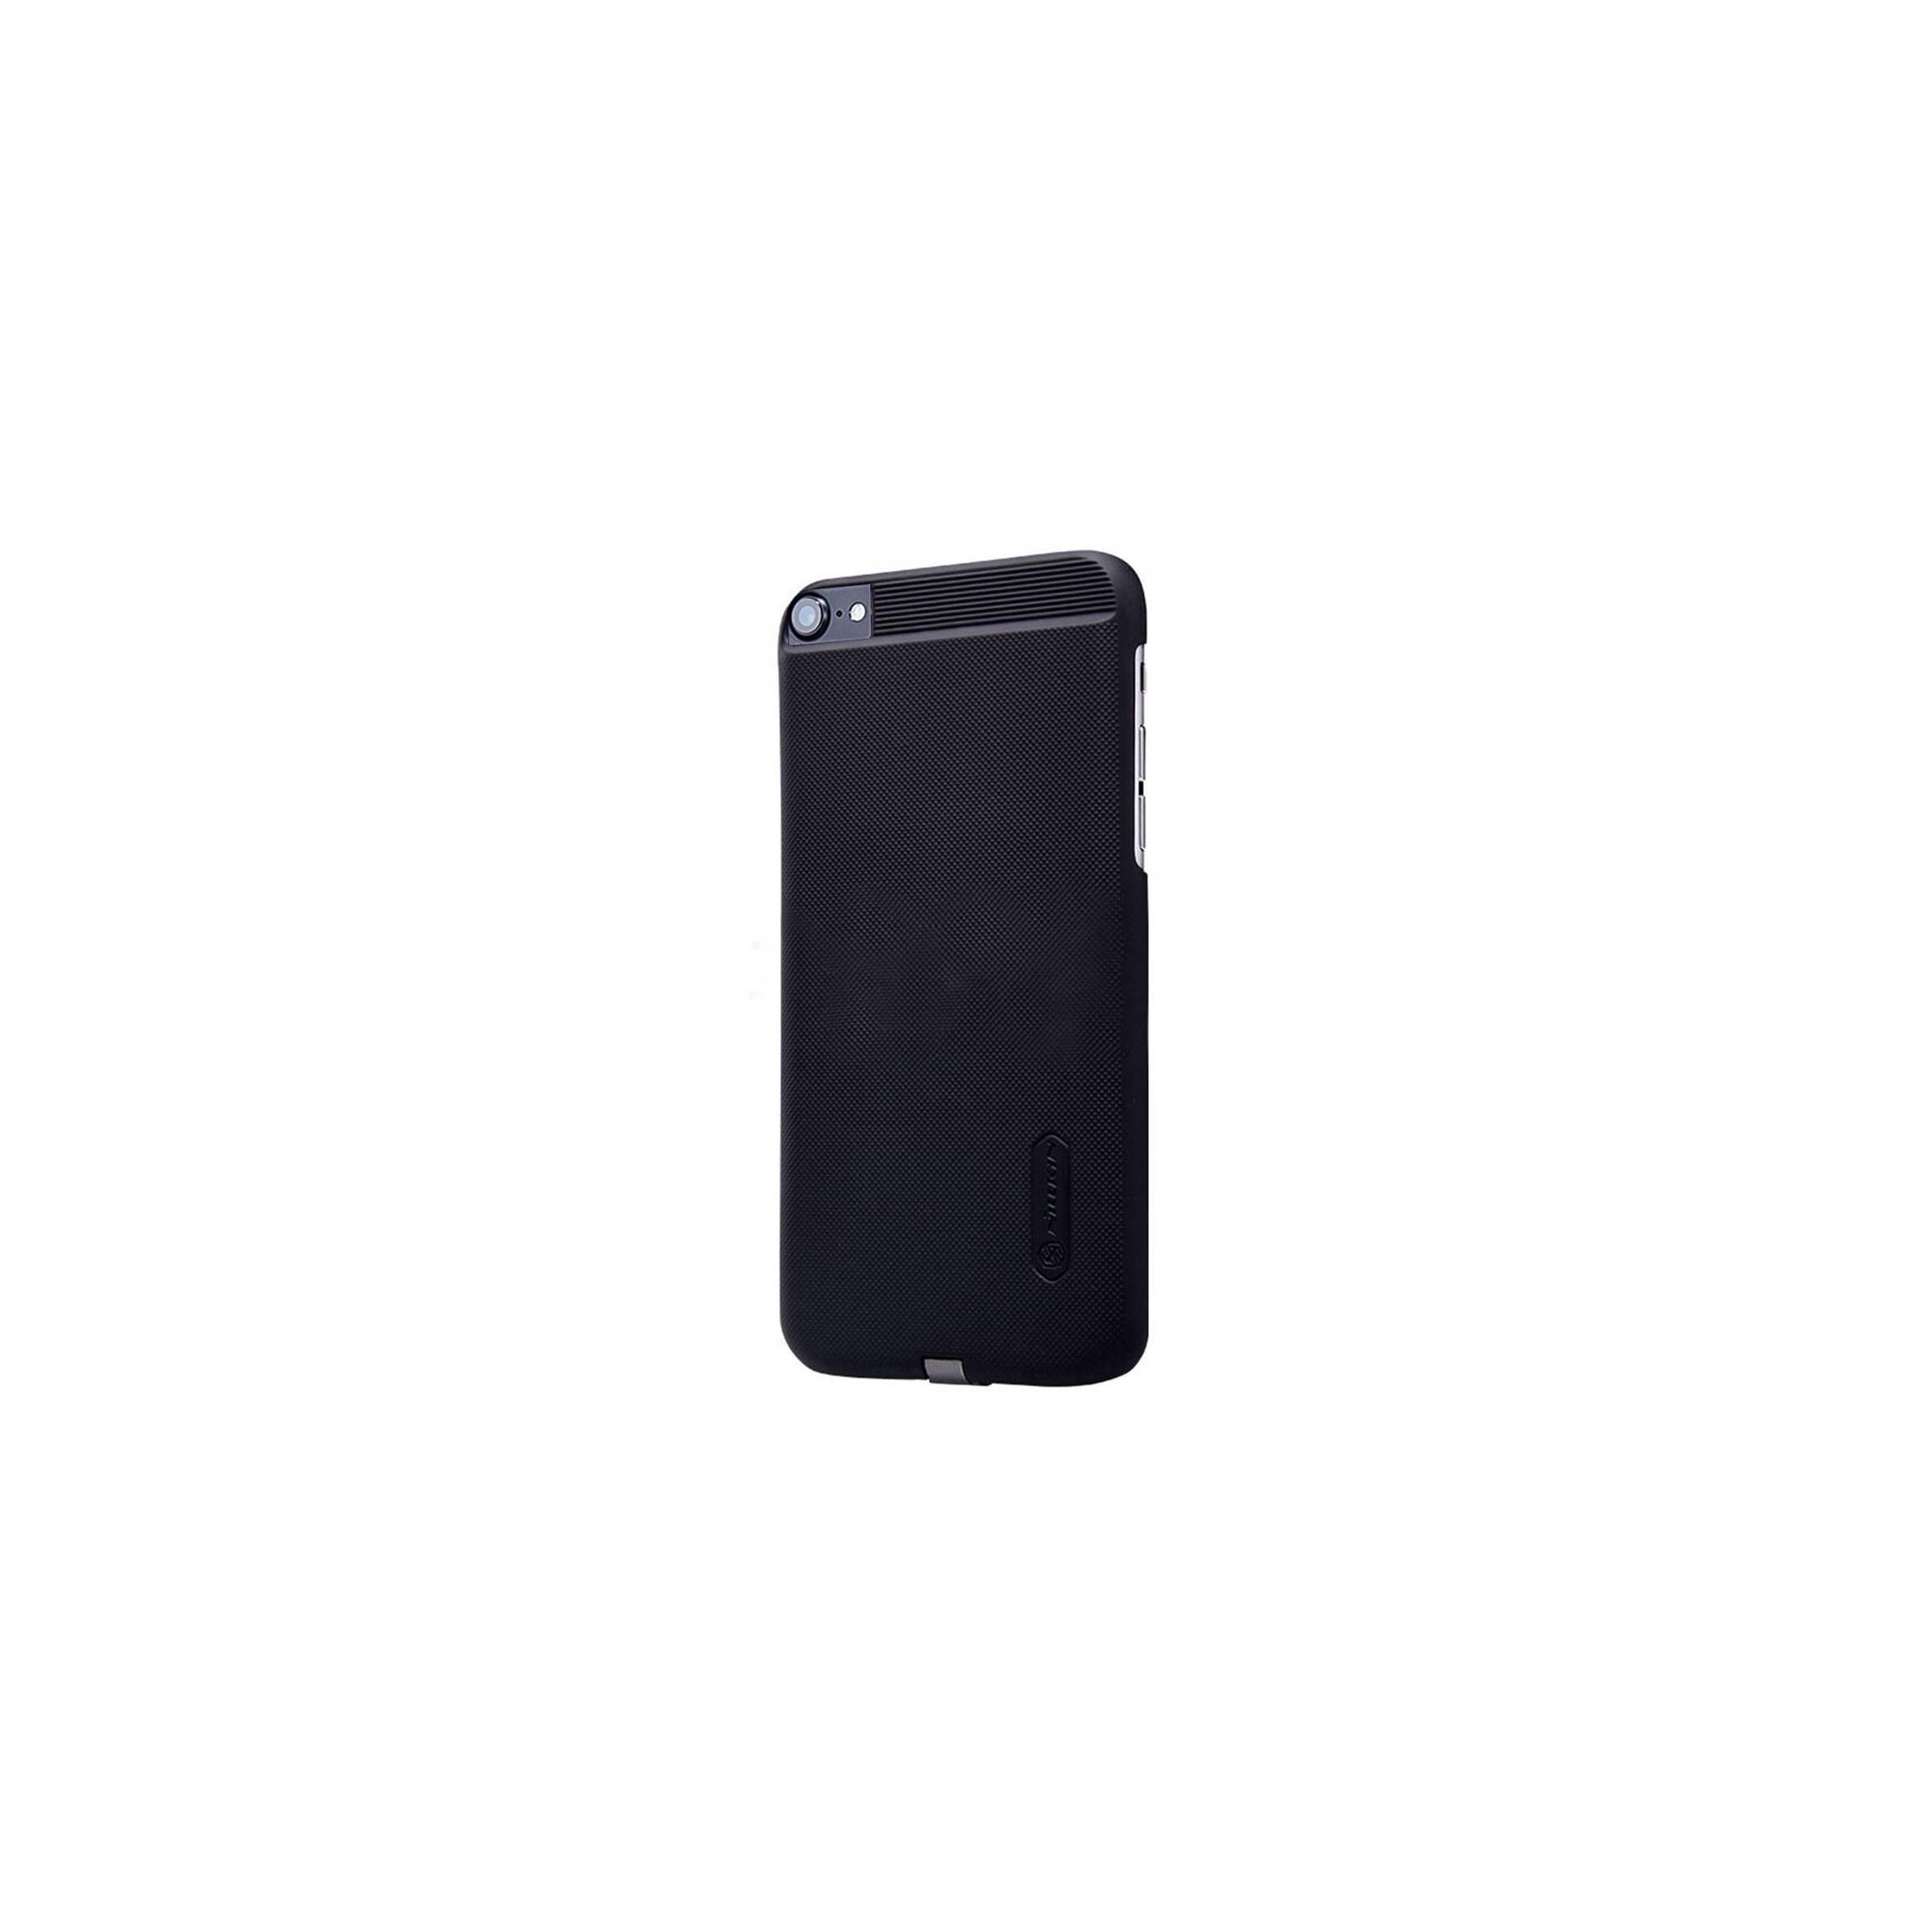 nillkin Magic cover til qi opladning på iphone iphone iphone 7 & iphone 8 / iphone se 2020 fra mackabler.dk